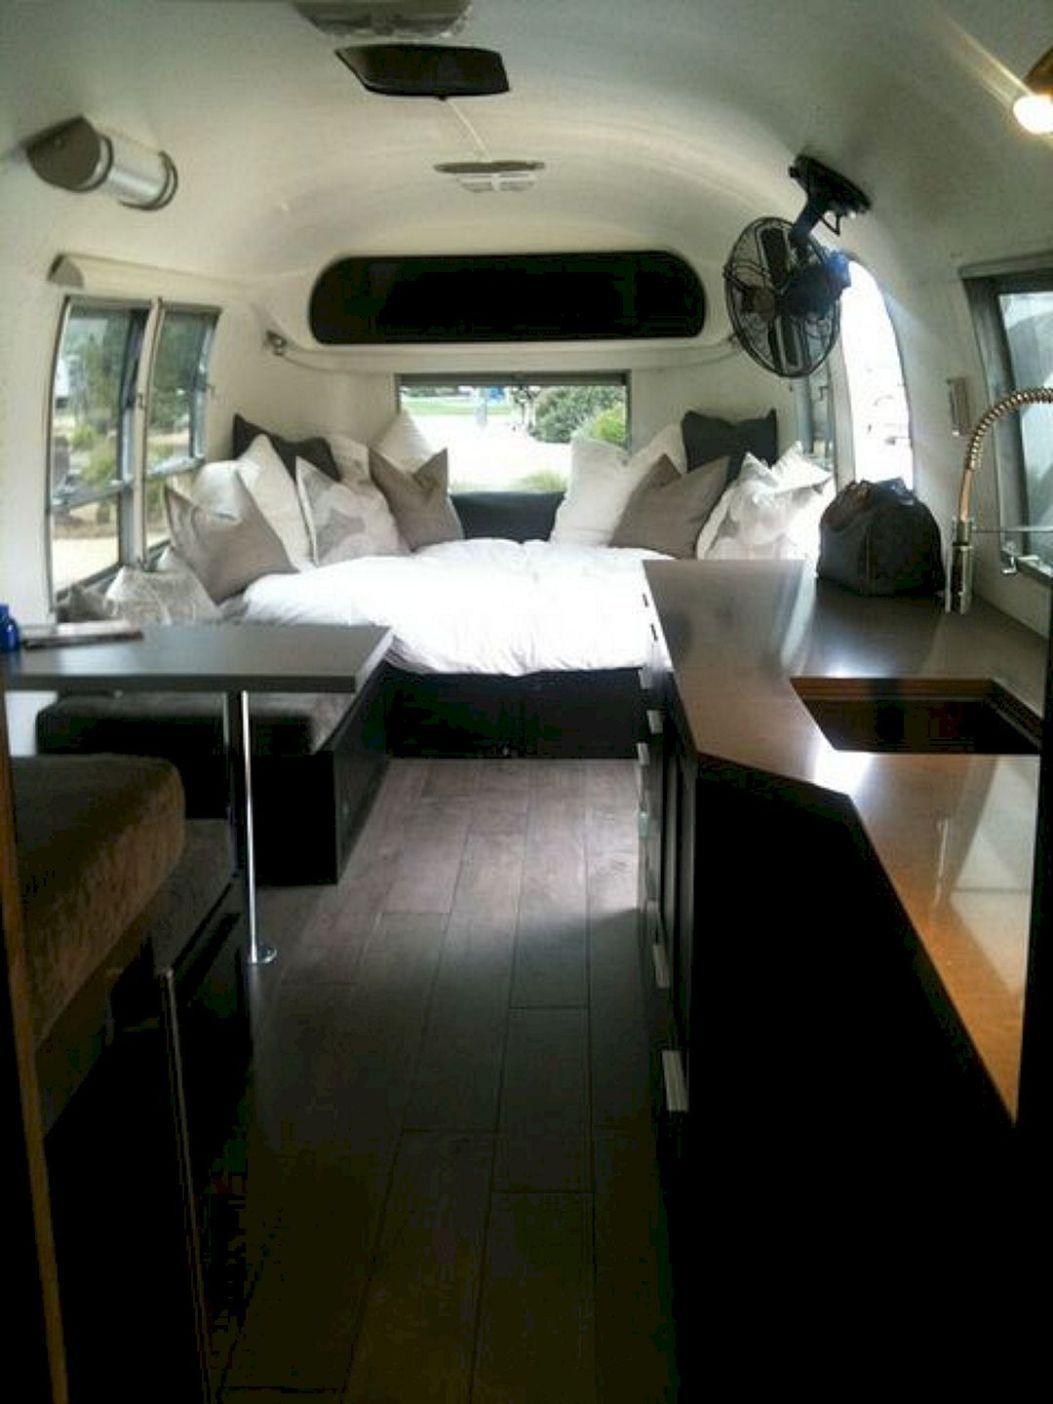 15 Stunning Airstream Trailer Hacks Remodel Makeover Ideas Freshouz Com Airstream Interior Airstream Renovation Trailer Interior